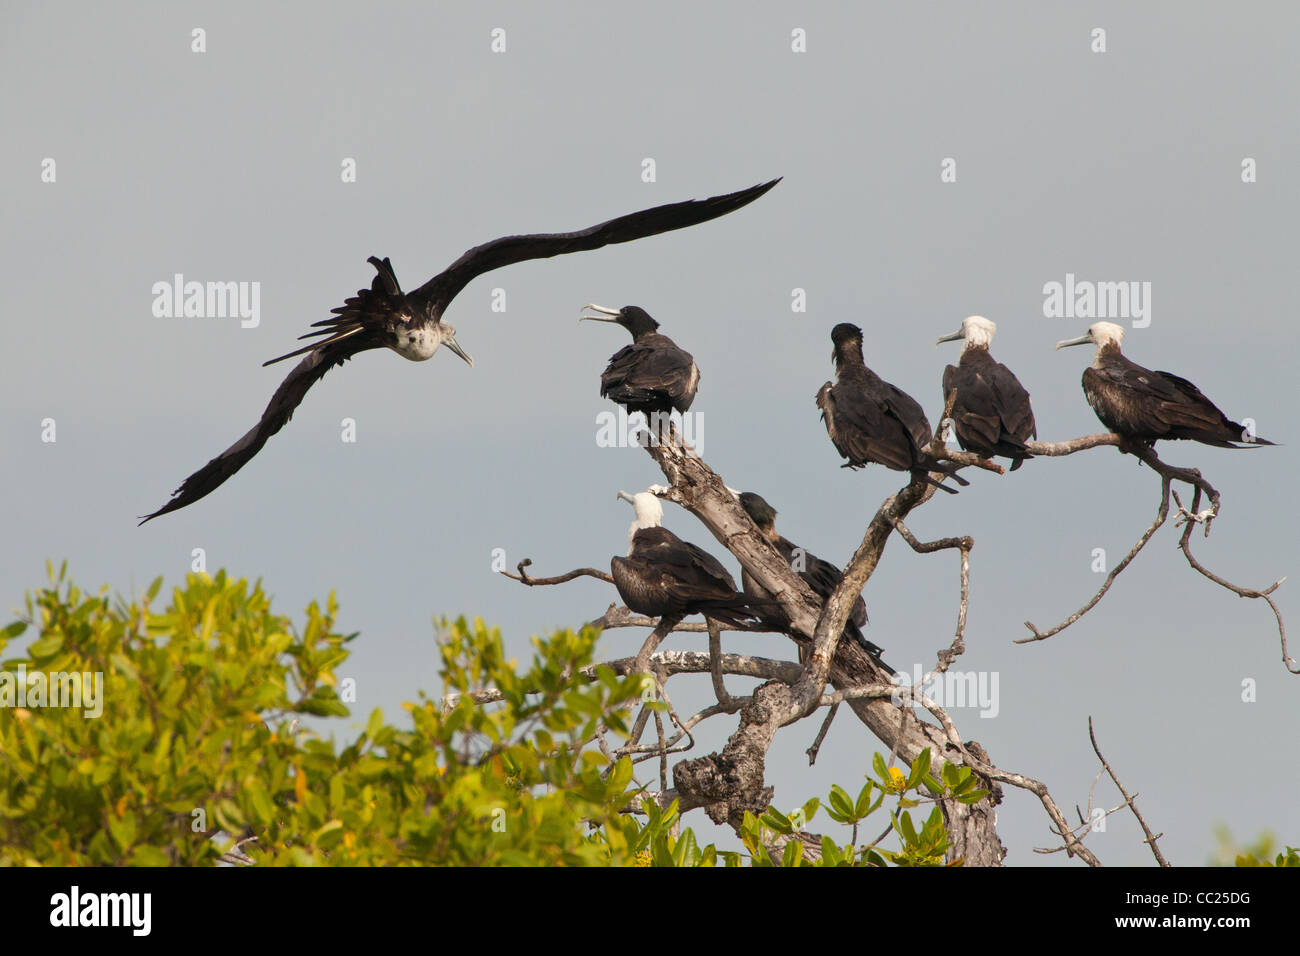 Colony of Magnificent Frigatebird, Fregata magnificens, at Punta Chame, Pacific coast, Panama province, Republic - Stock Image